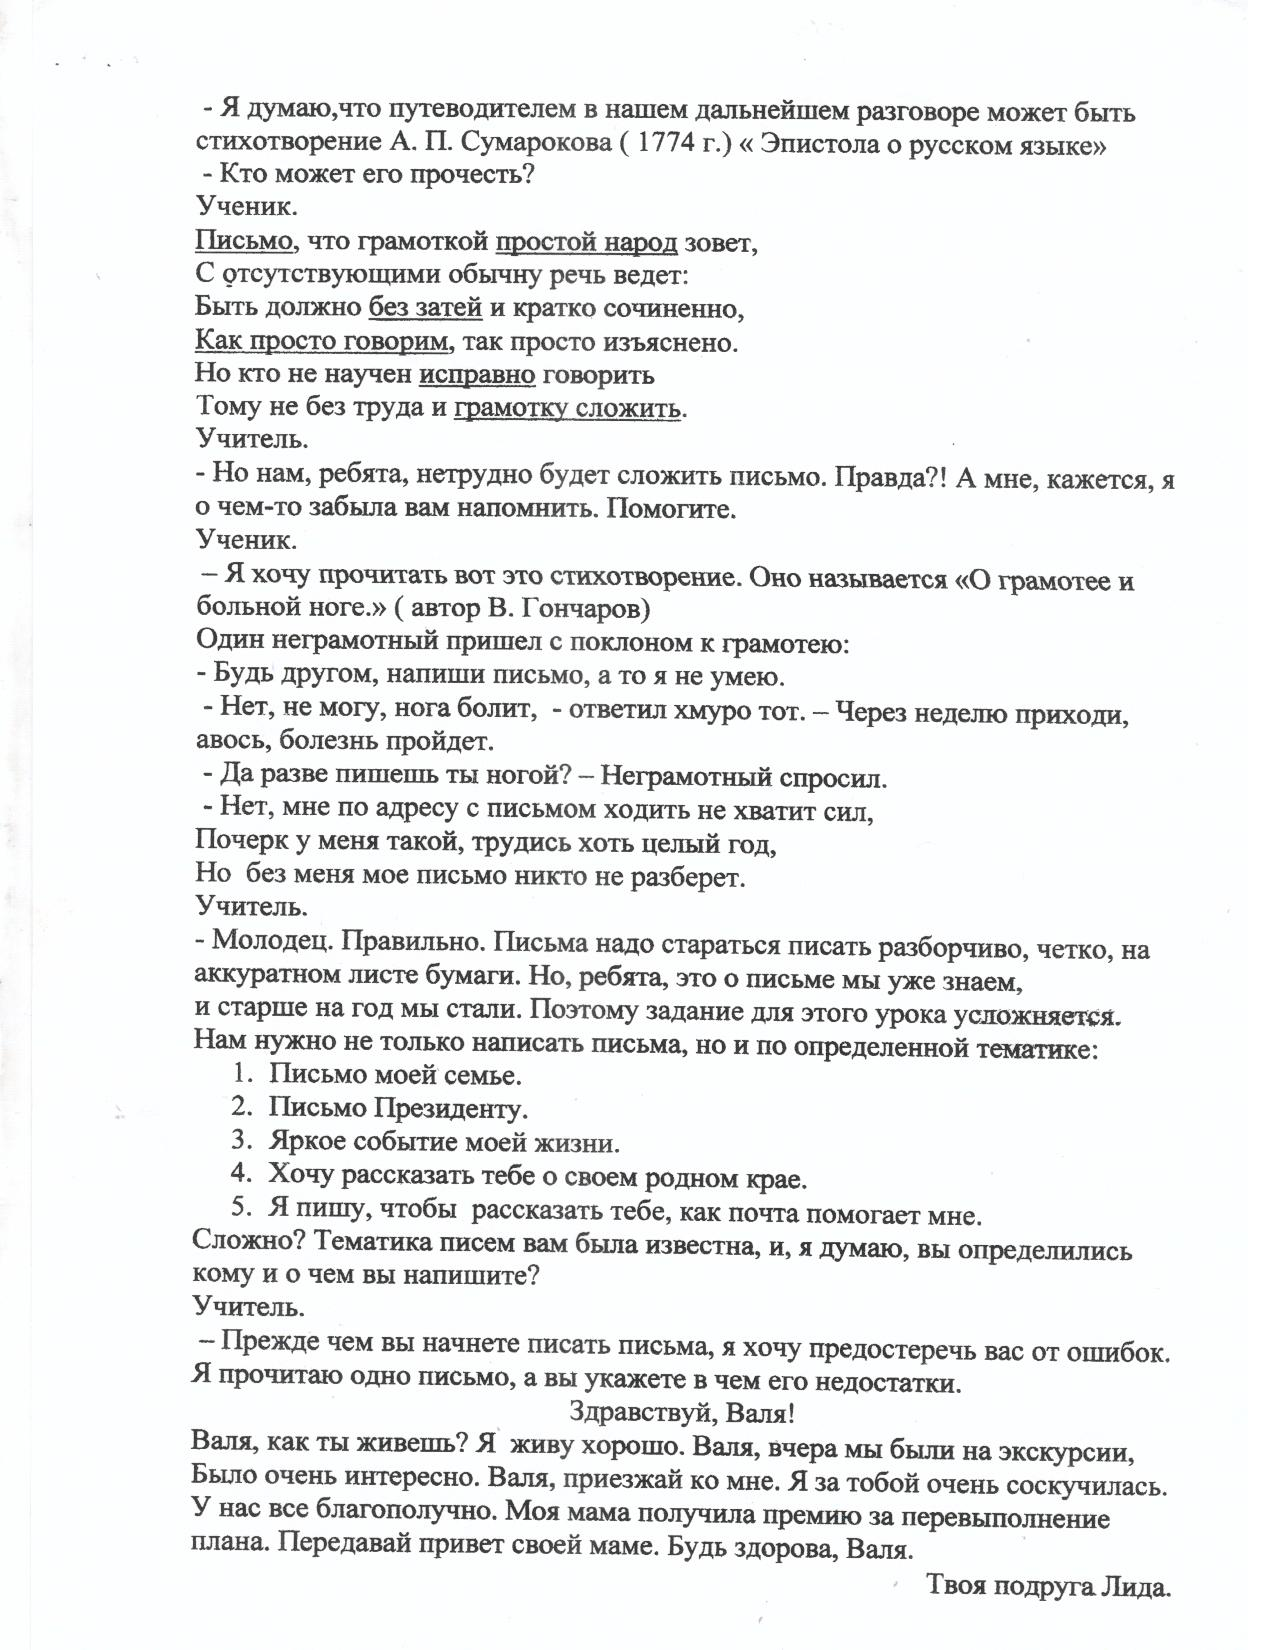 H:\сканер работ\Урок письма\стр6.jpg